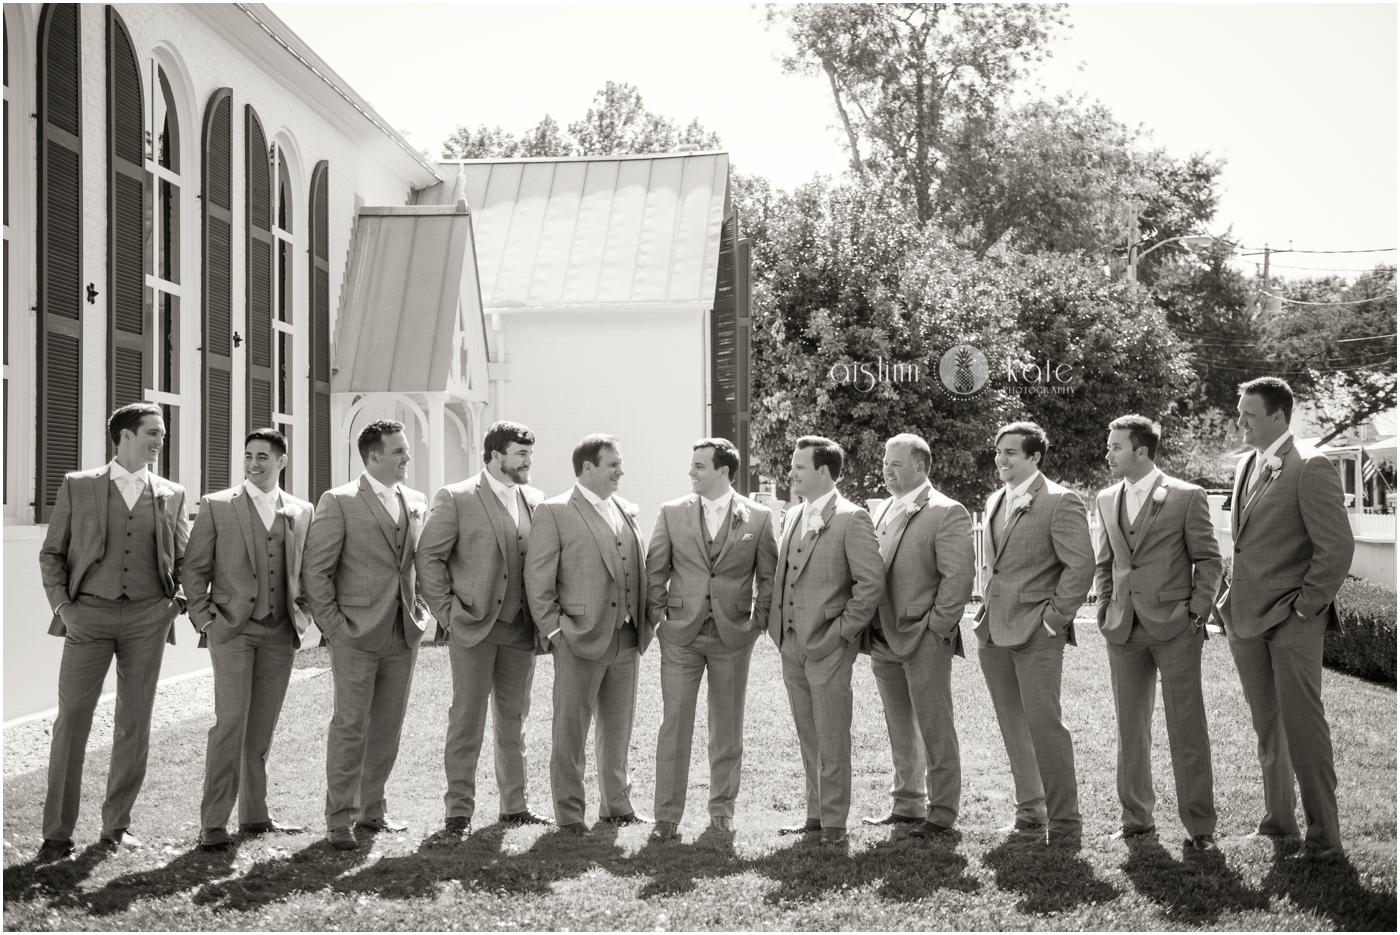 Pensacola-Destin-Wedding-Photographer_6173.jpg